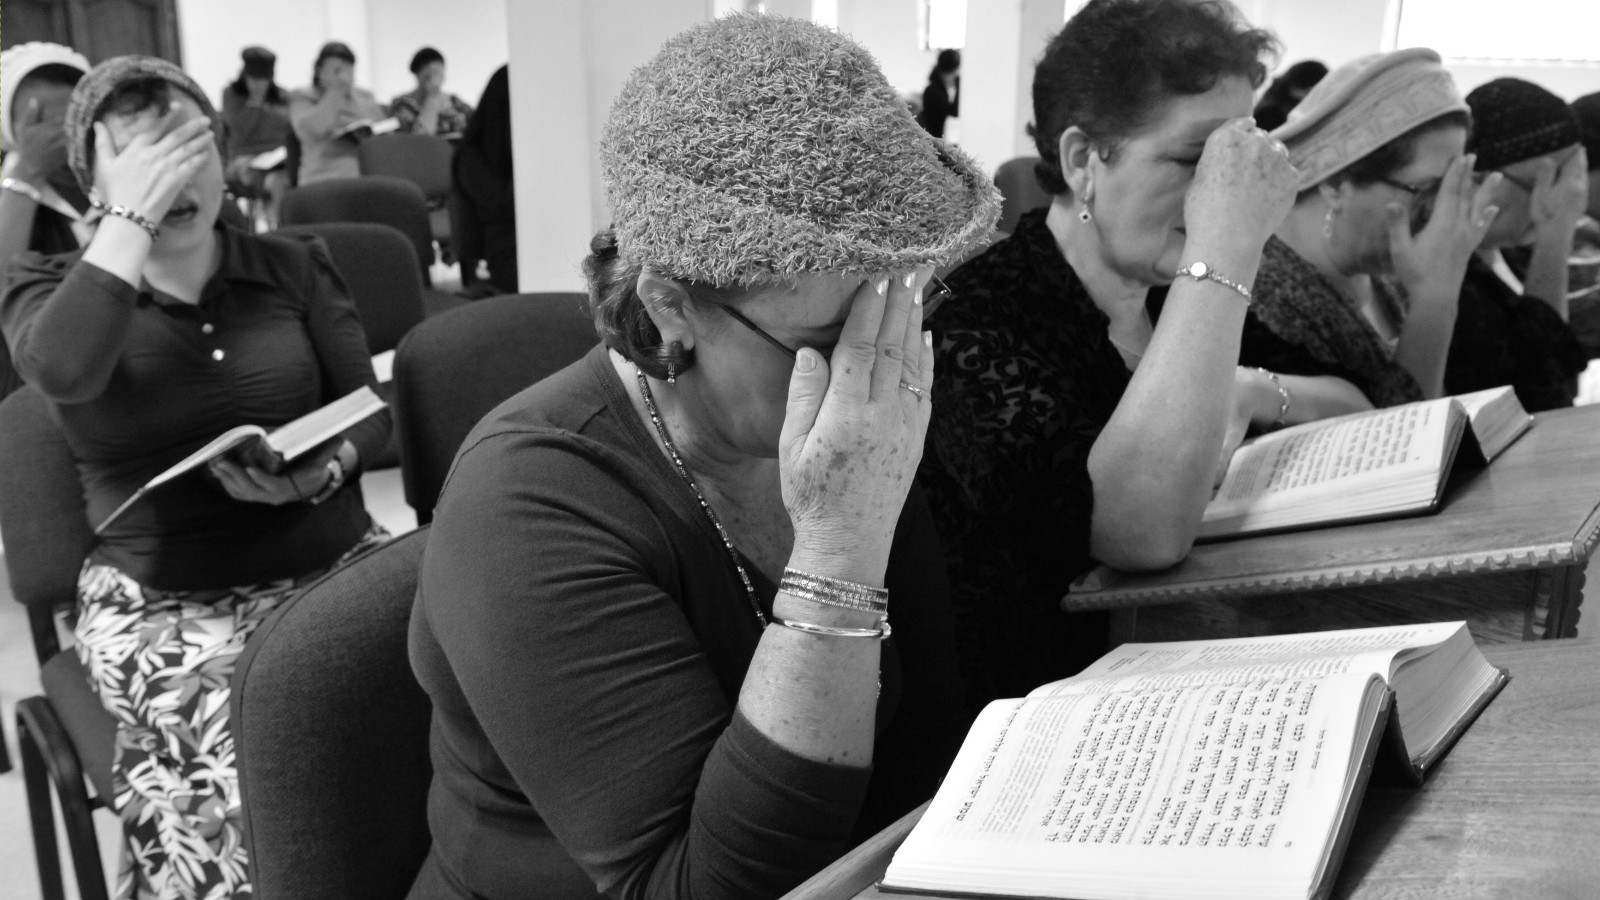 The Shema | My Jewish Learning